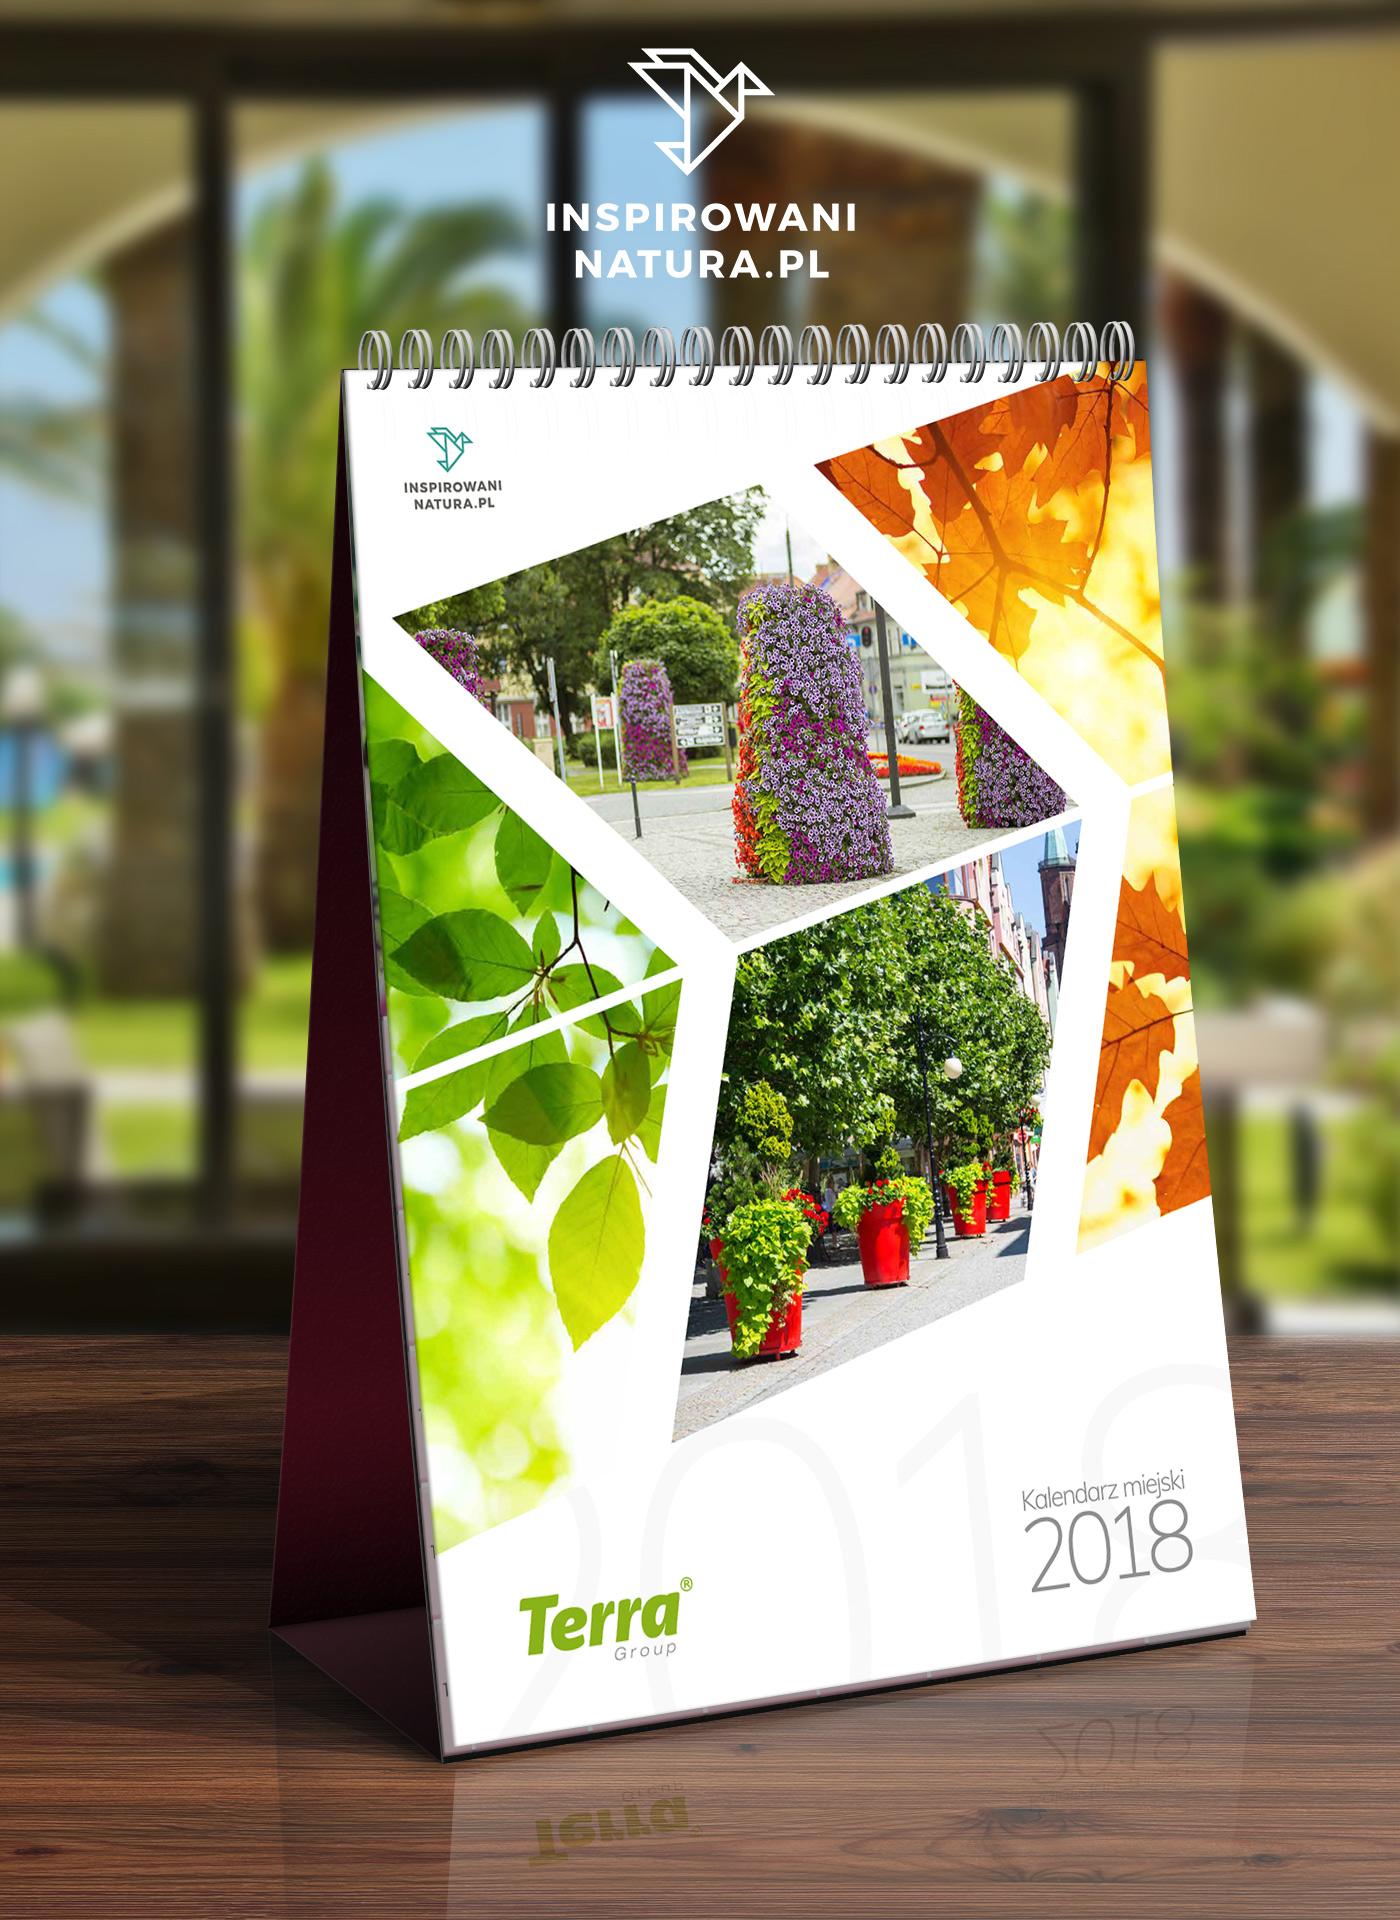 kalendarz miejski terra group inspirowani naturą